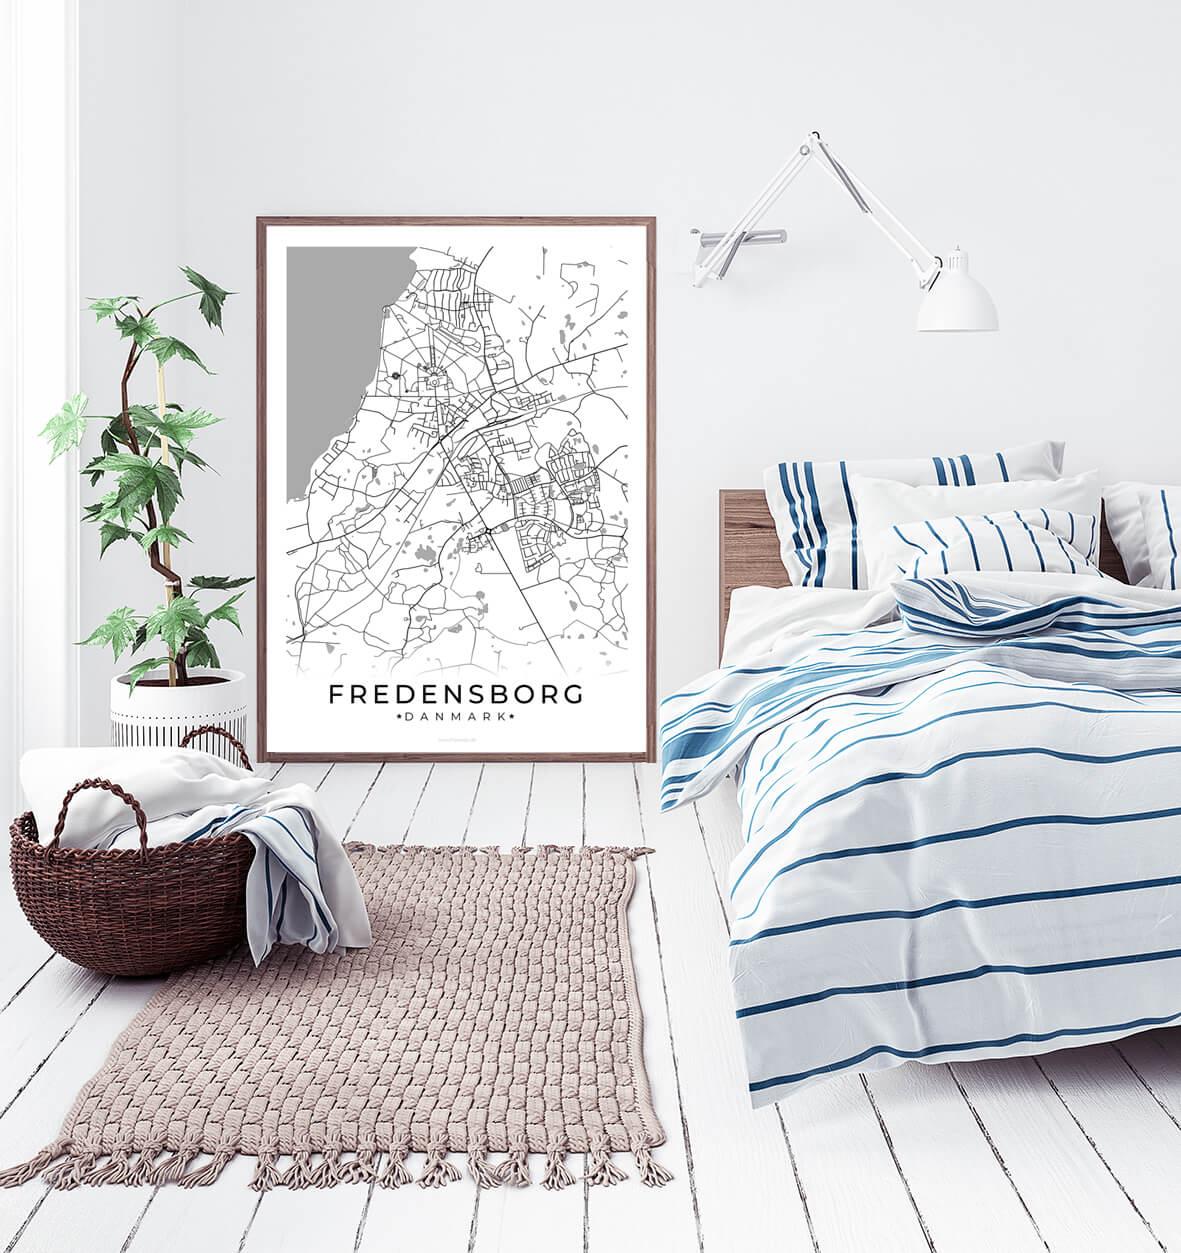 Fredensborg-hvid-byplakat-2